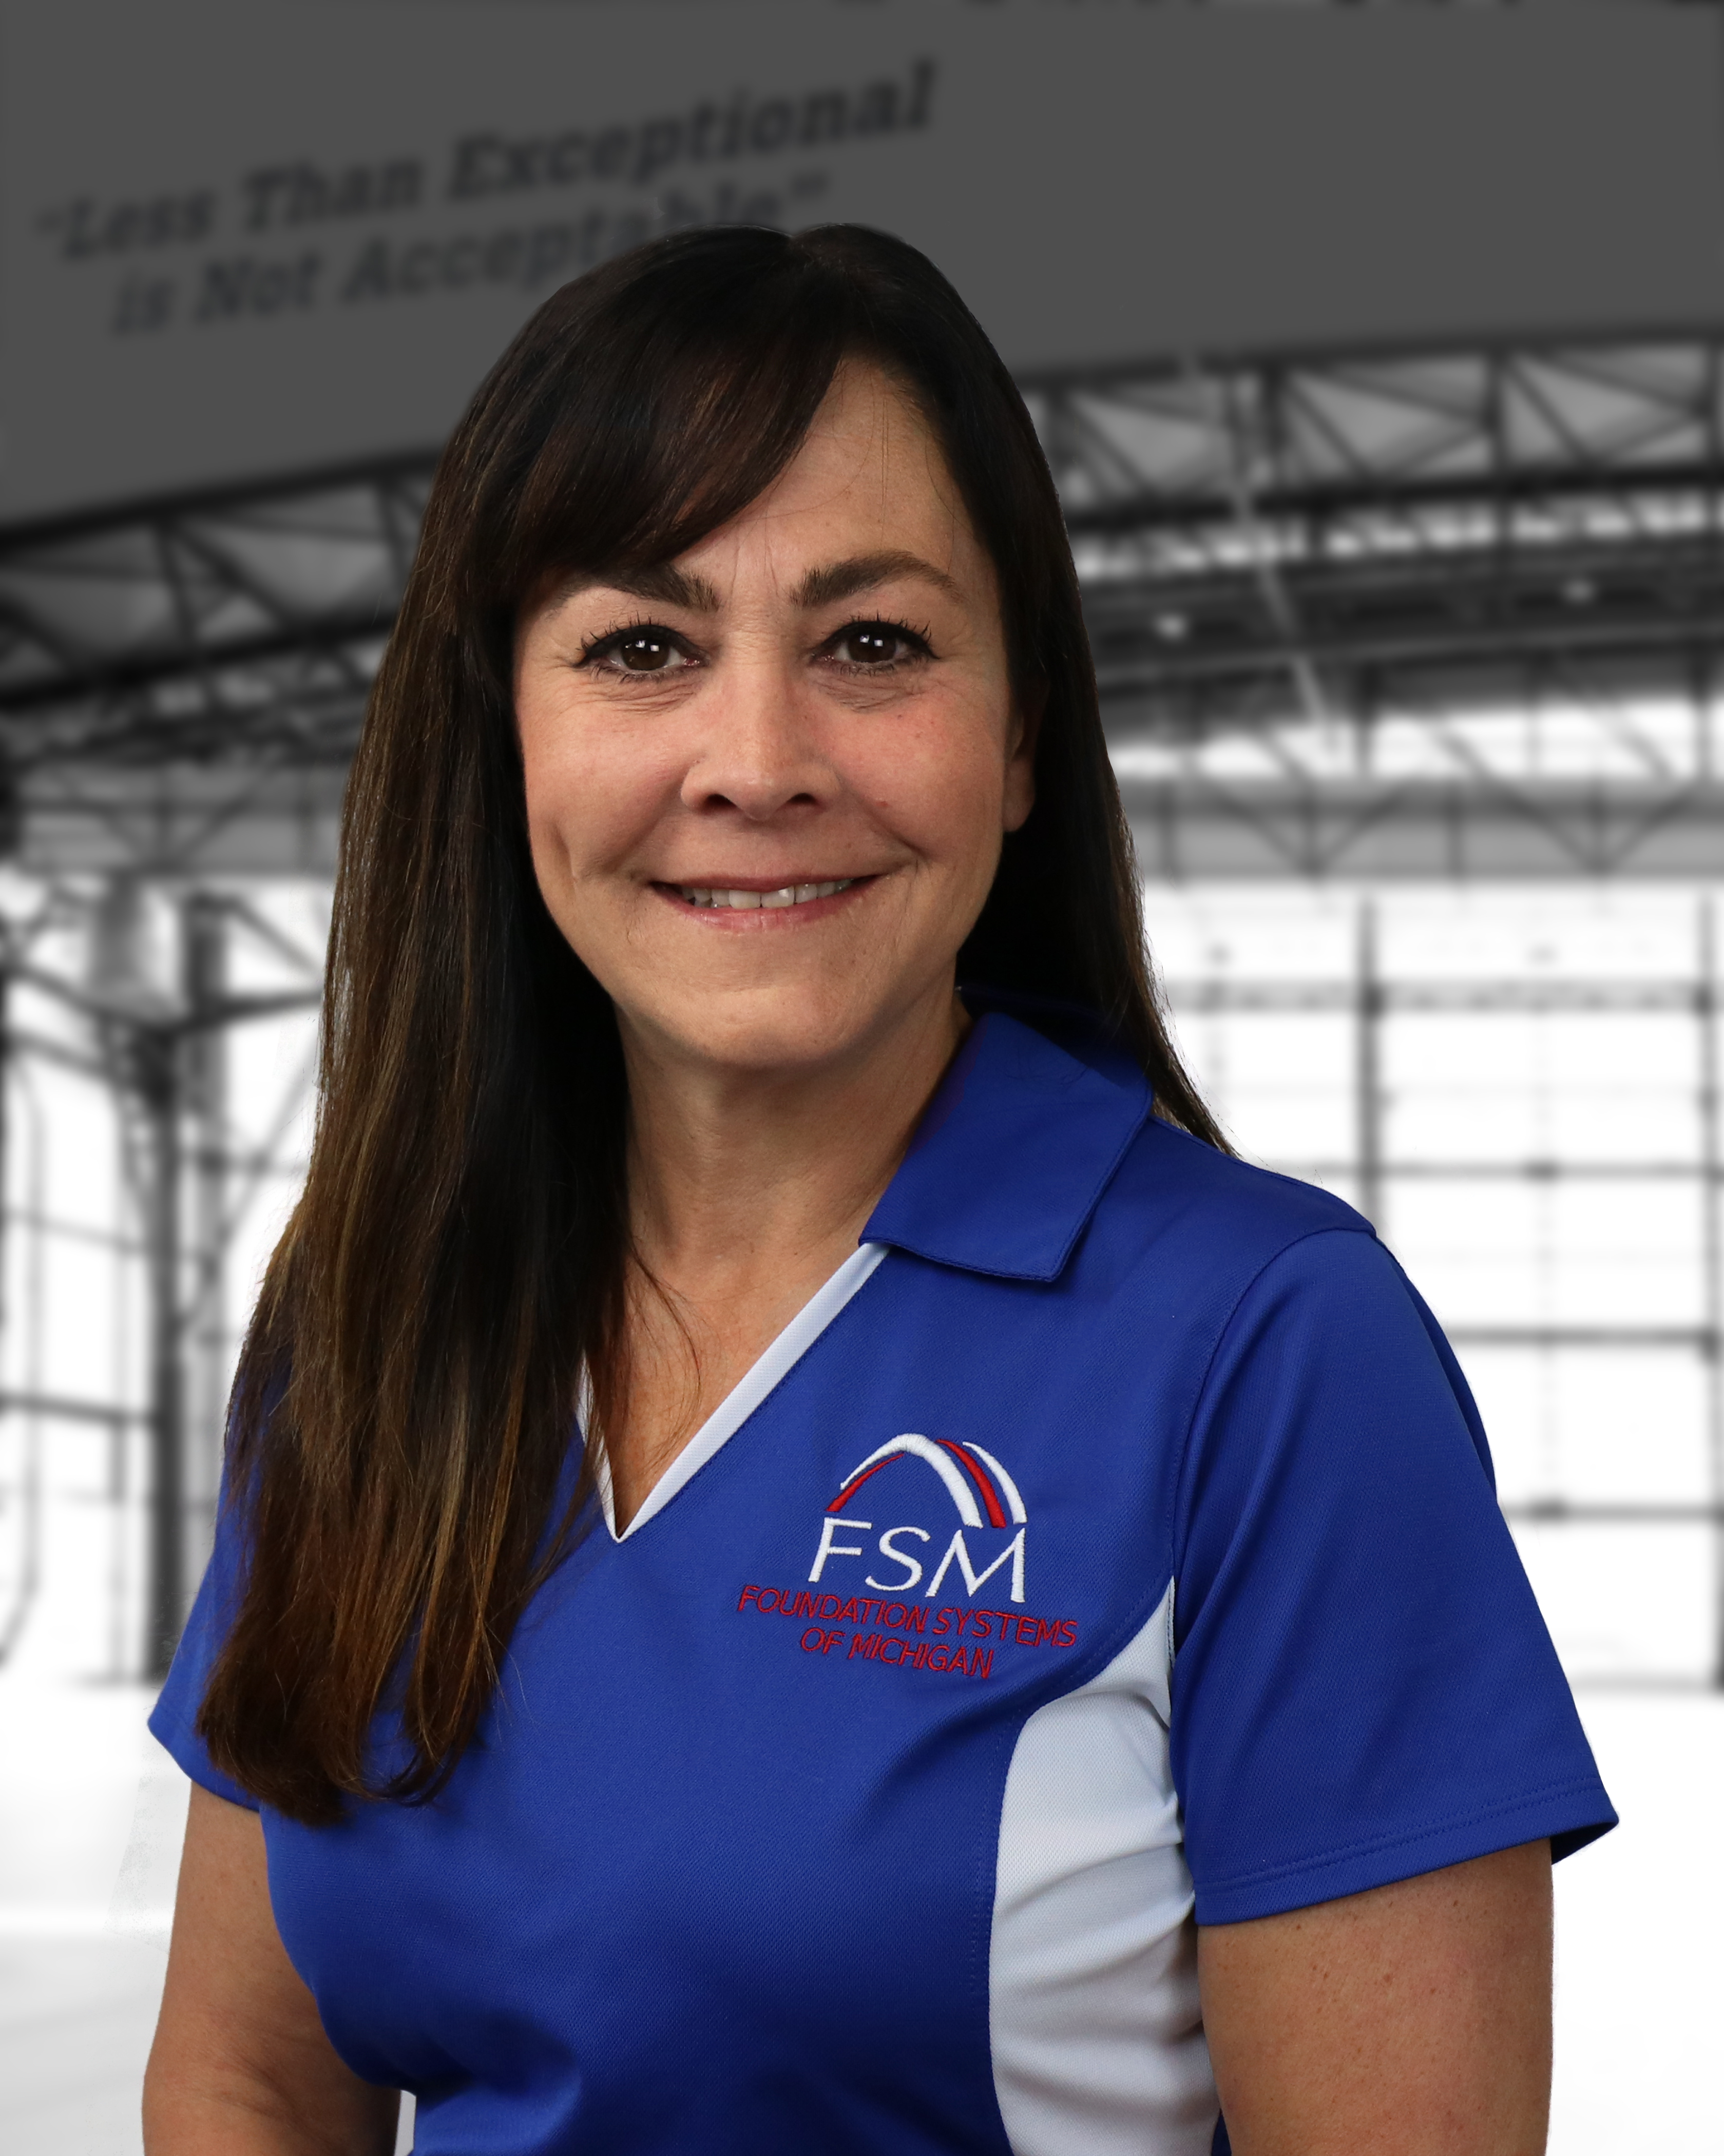 FSM Brenda Torolski Appointment Center Representative